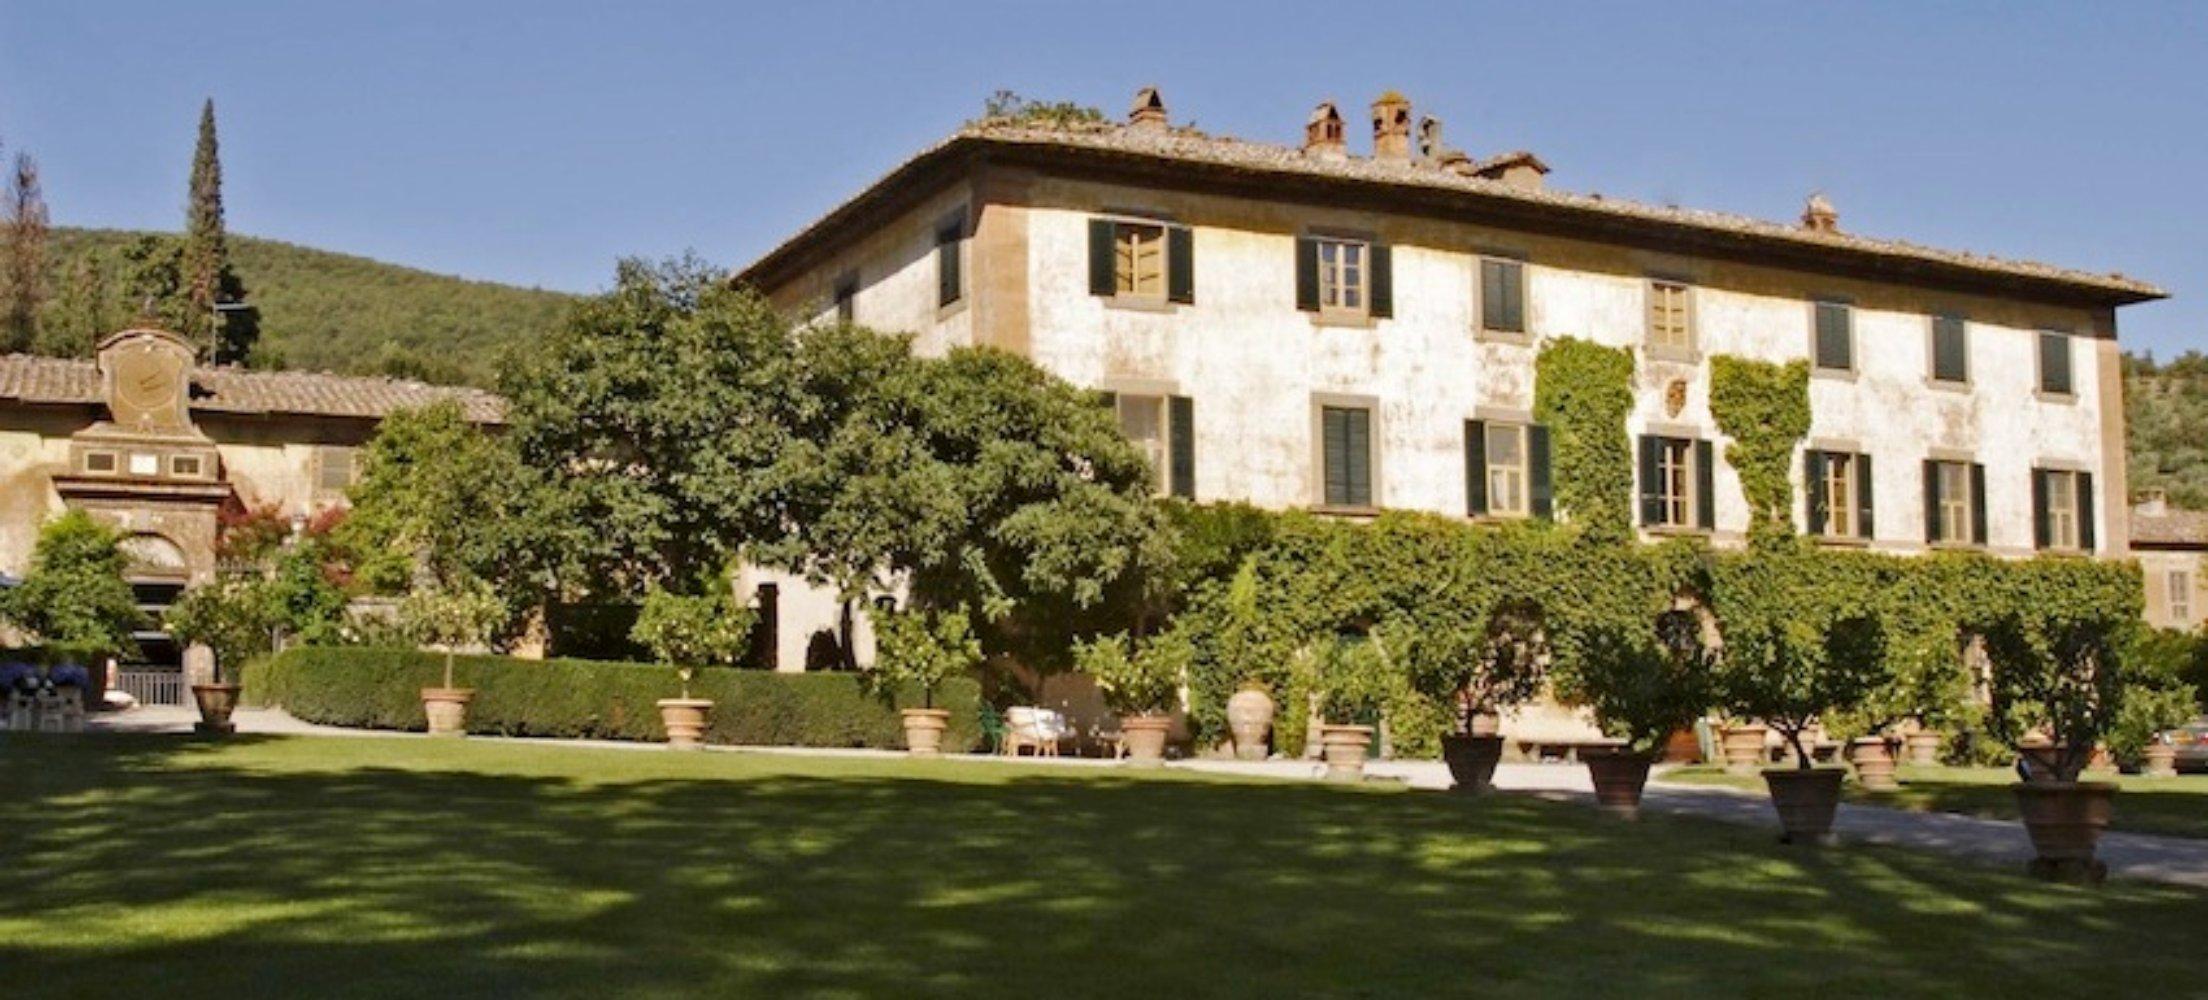 Villas and gardens around Cortona   Visit Tuscany